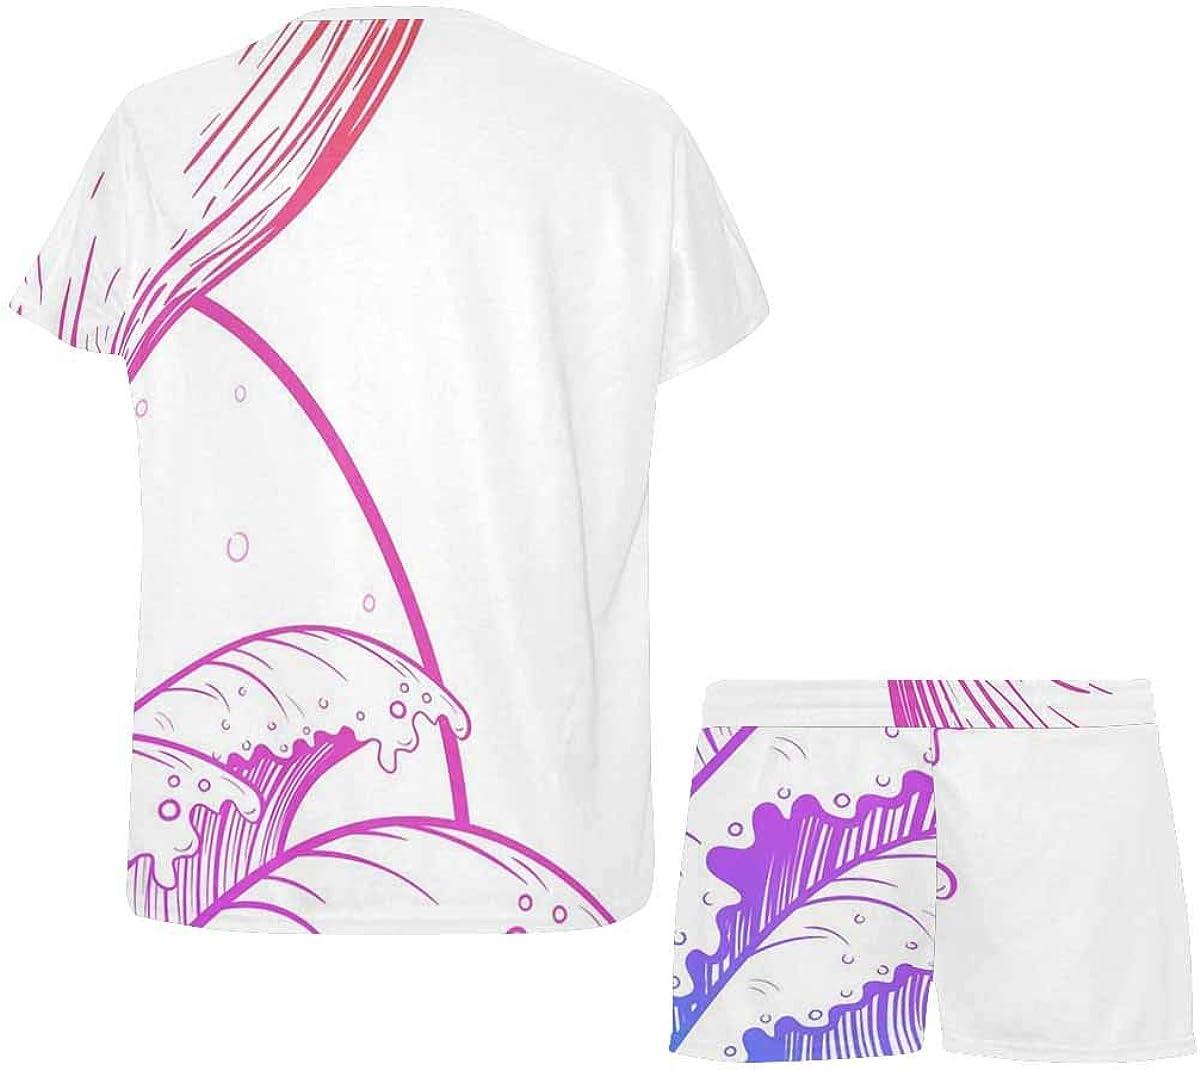 InterestPrint Whale Tail in Sea Waves, Boho Women's Lightweight Pajama Set, Short Summer Pjs